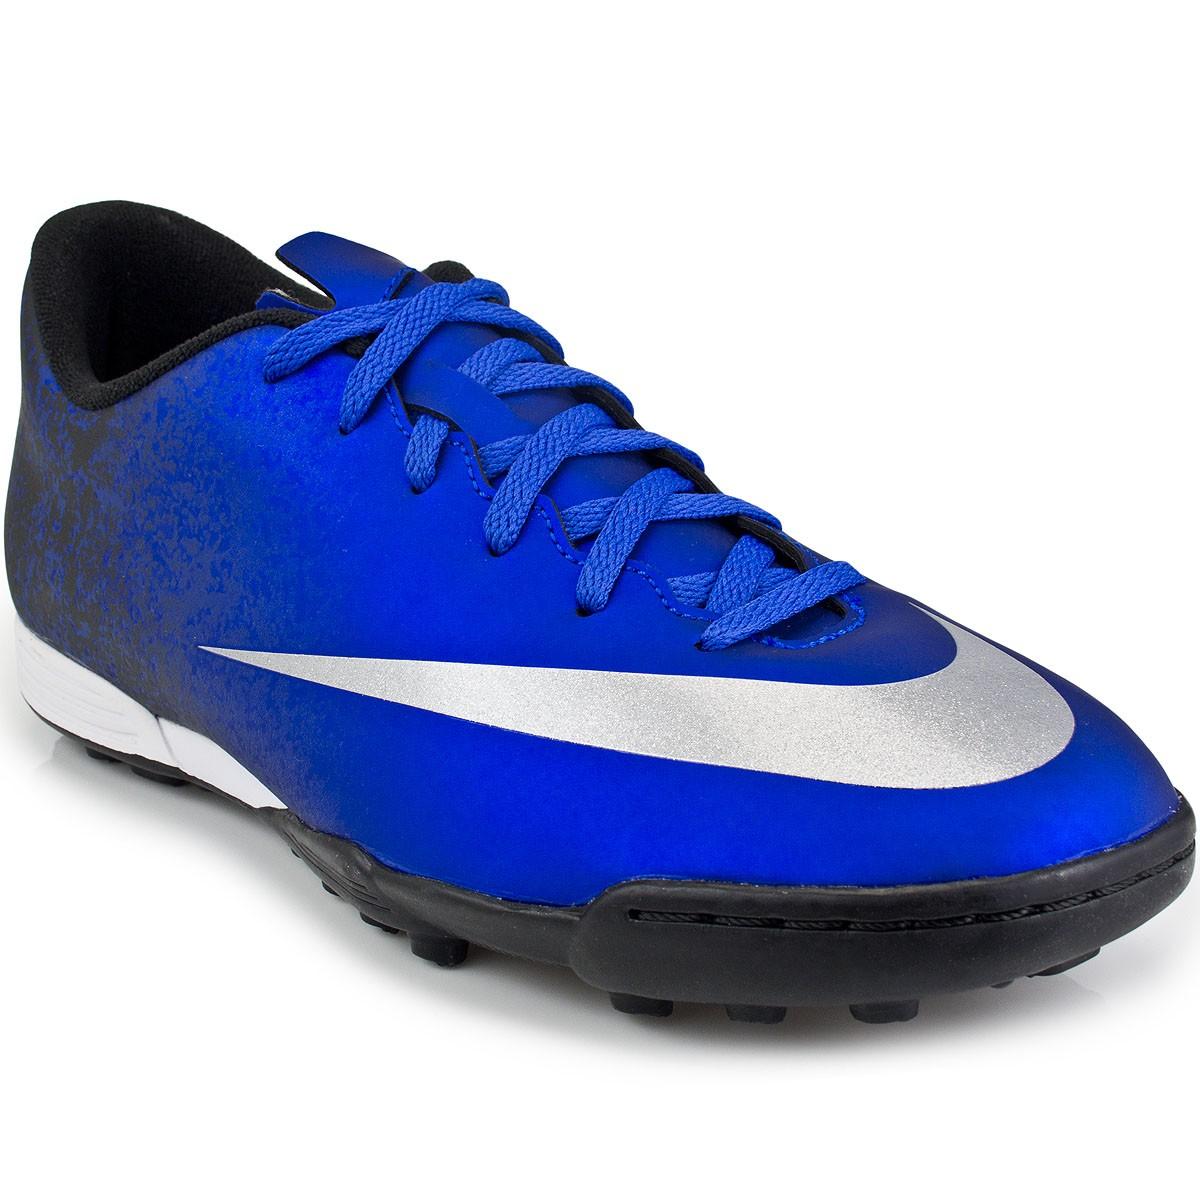 5124a1cbce981 Chuteira Nike Mercurial Vortex II CR TF